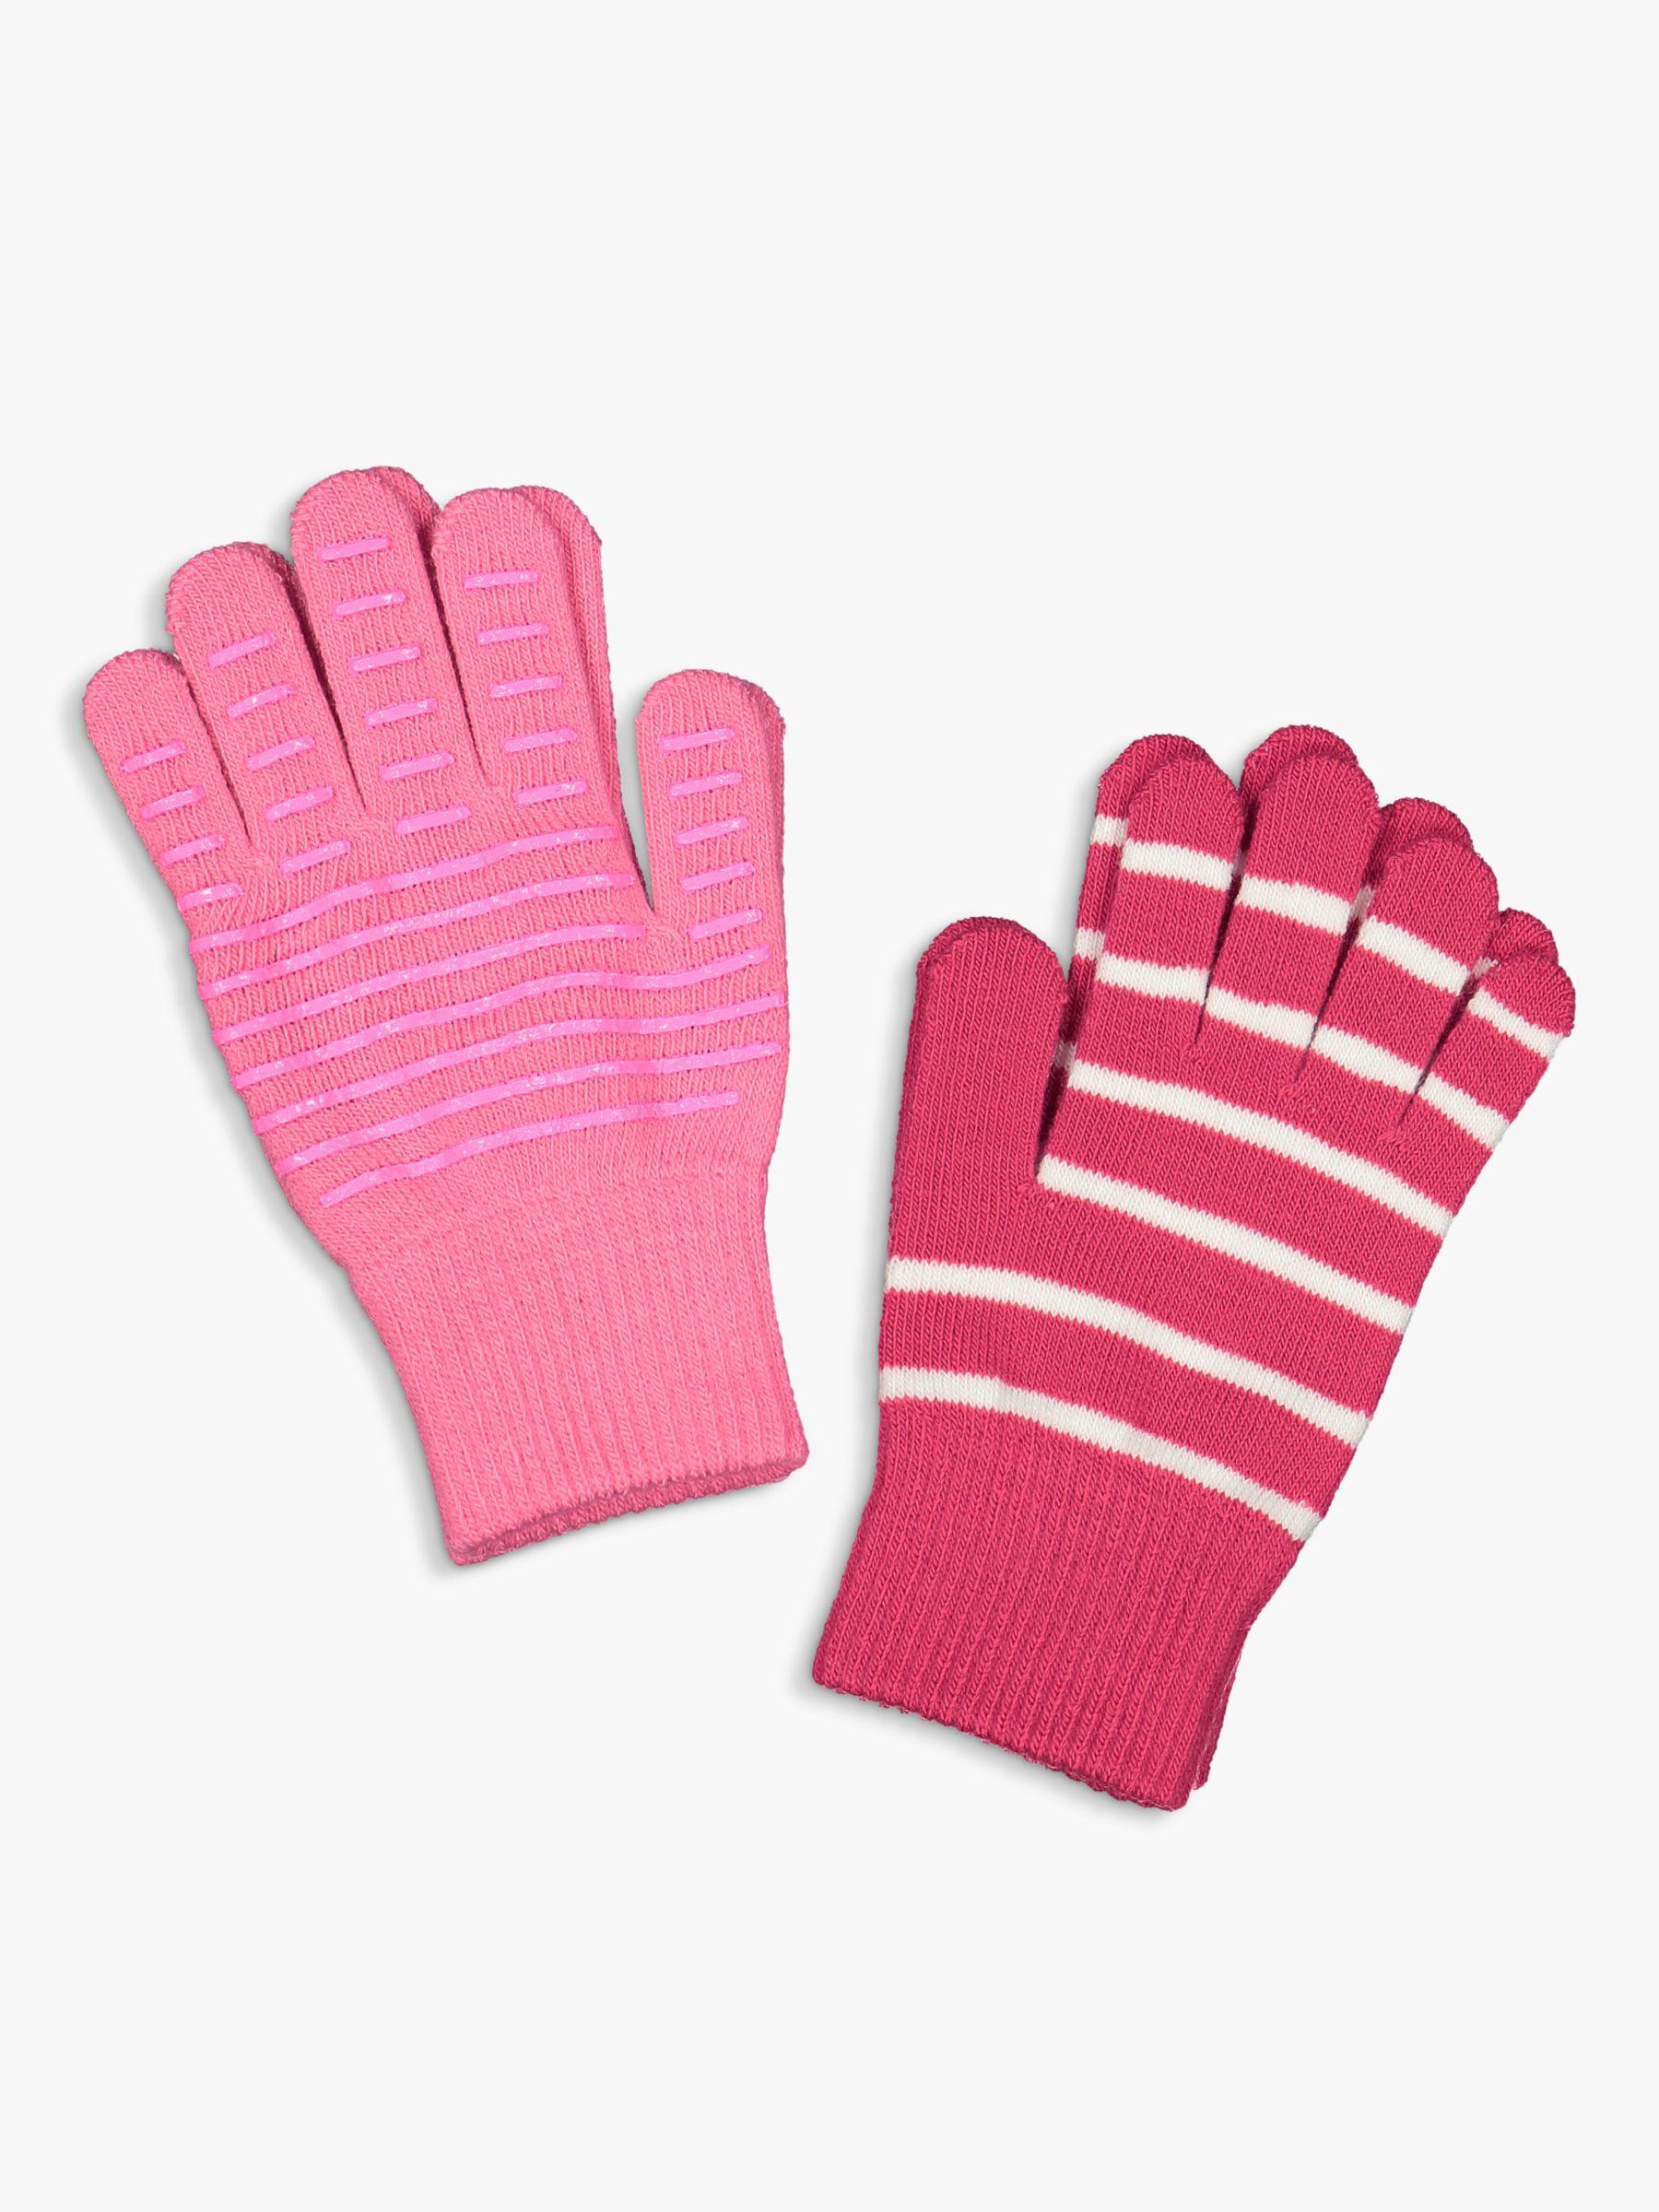 Polarn O. Pyret Polarn O. Pyret Children's Magic Gloves, Pack of 2